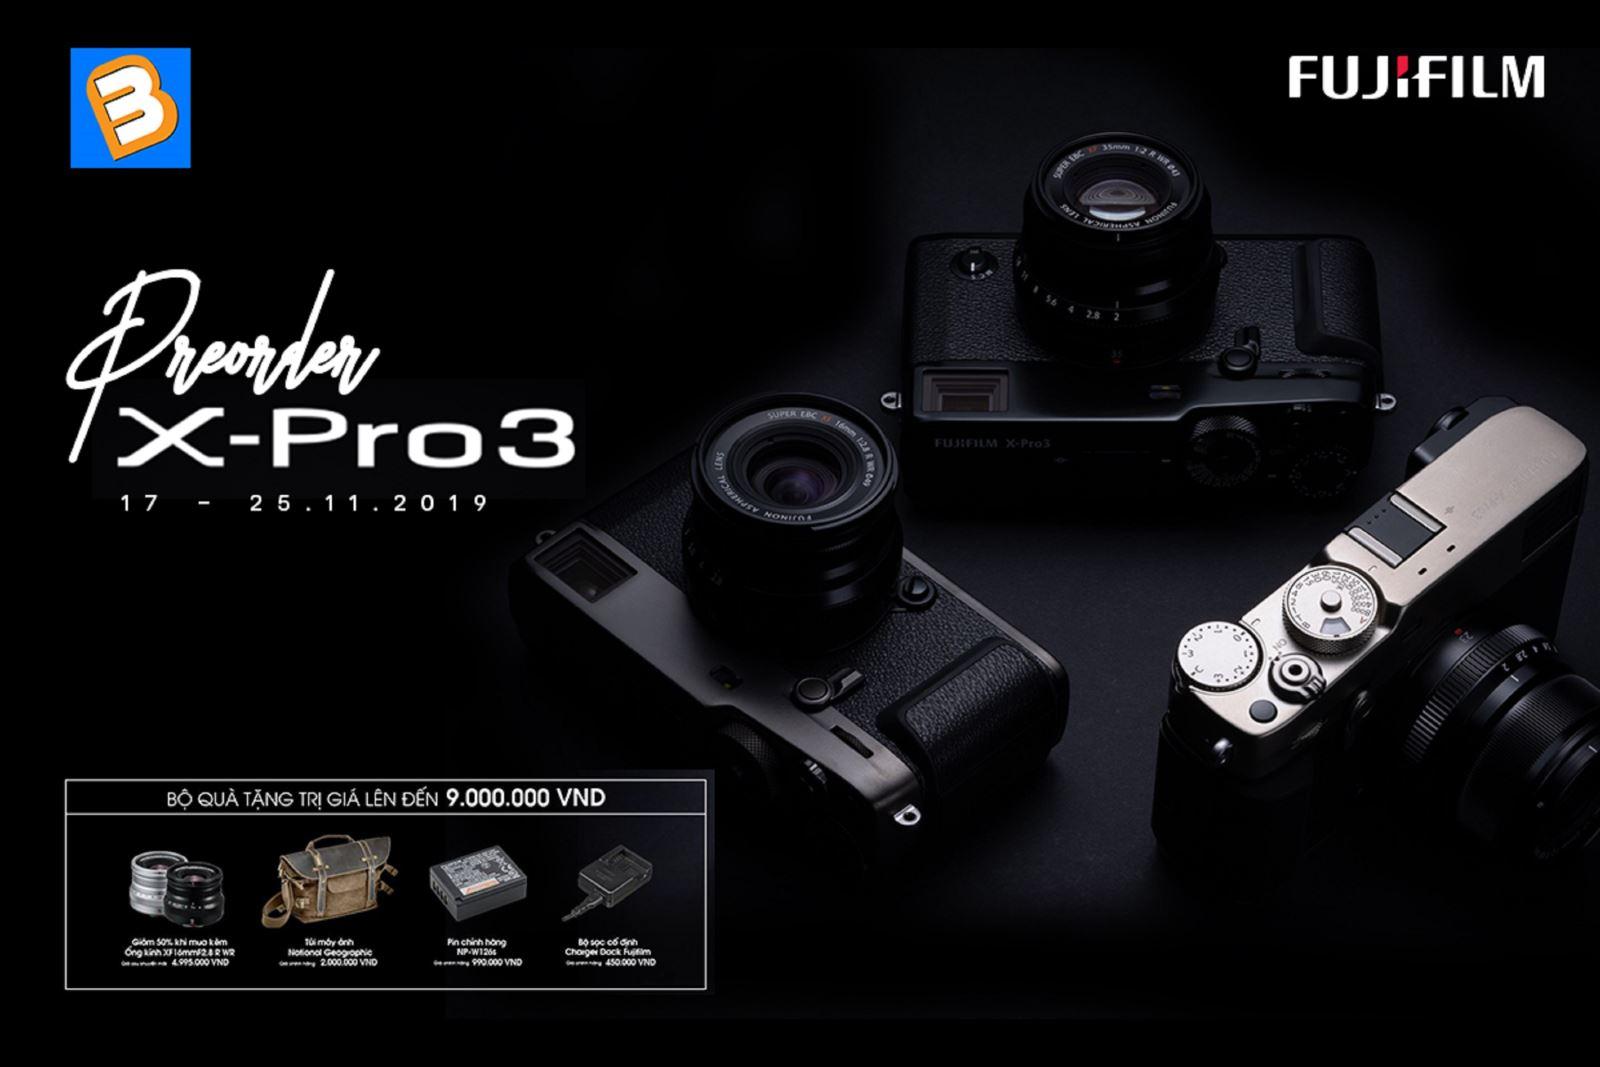 Pre-Order máy ảnhFujifilm X-Pro3